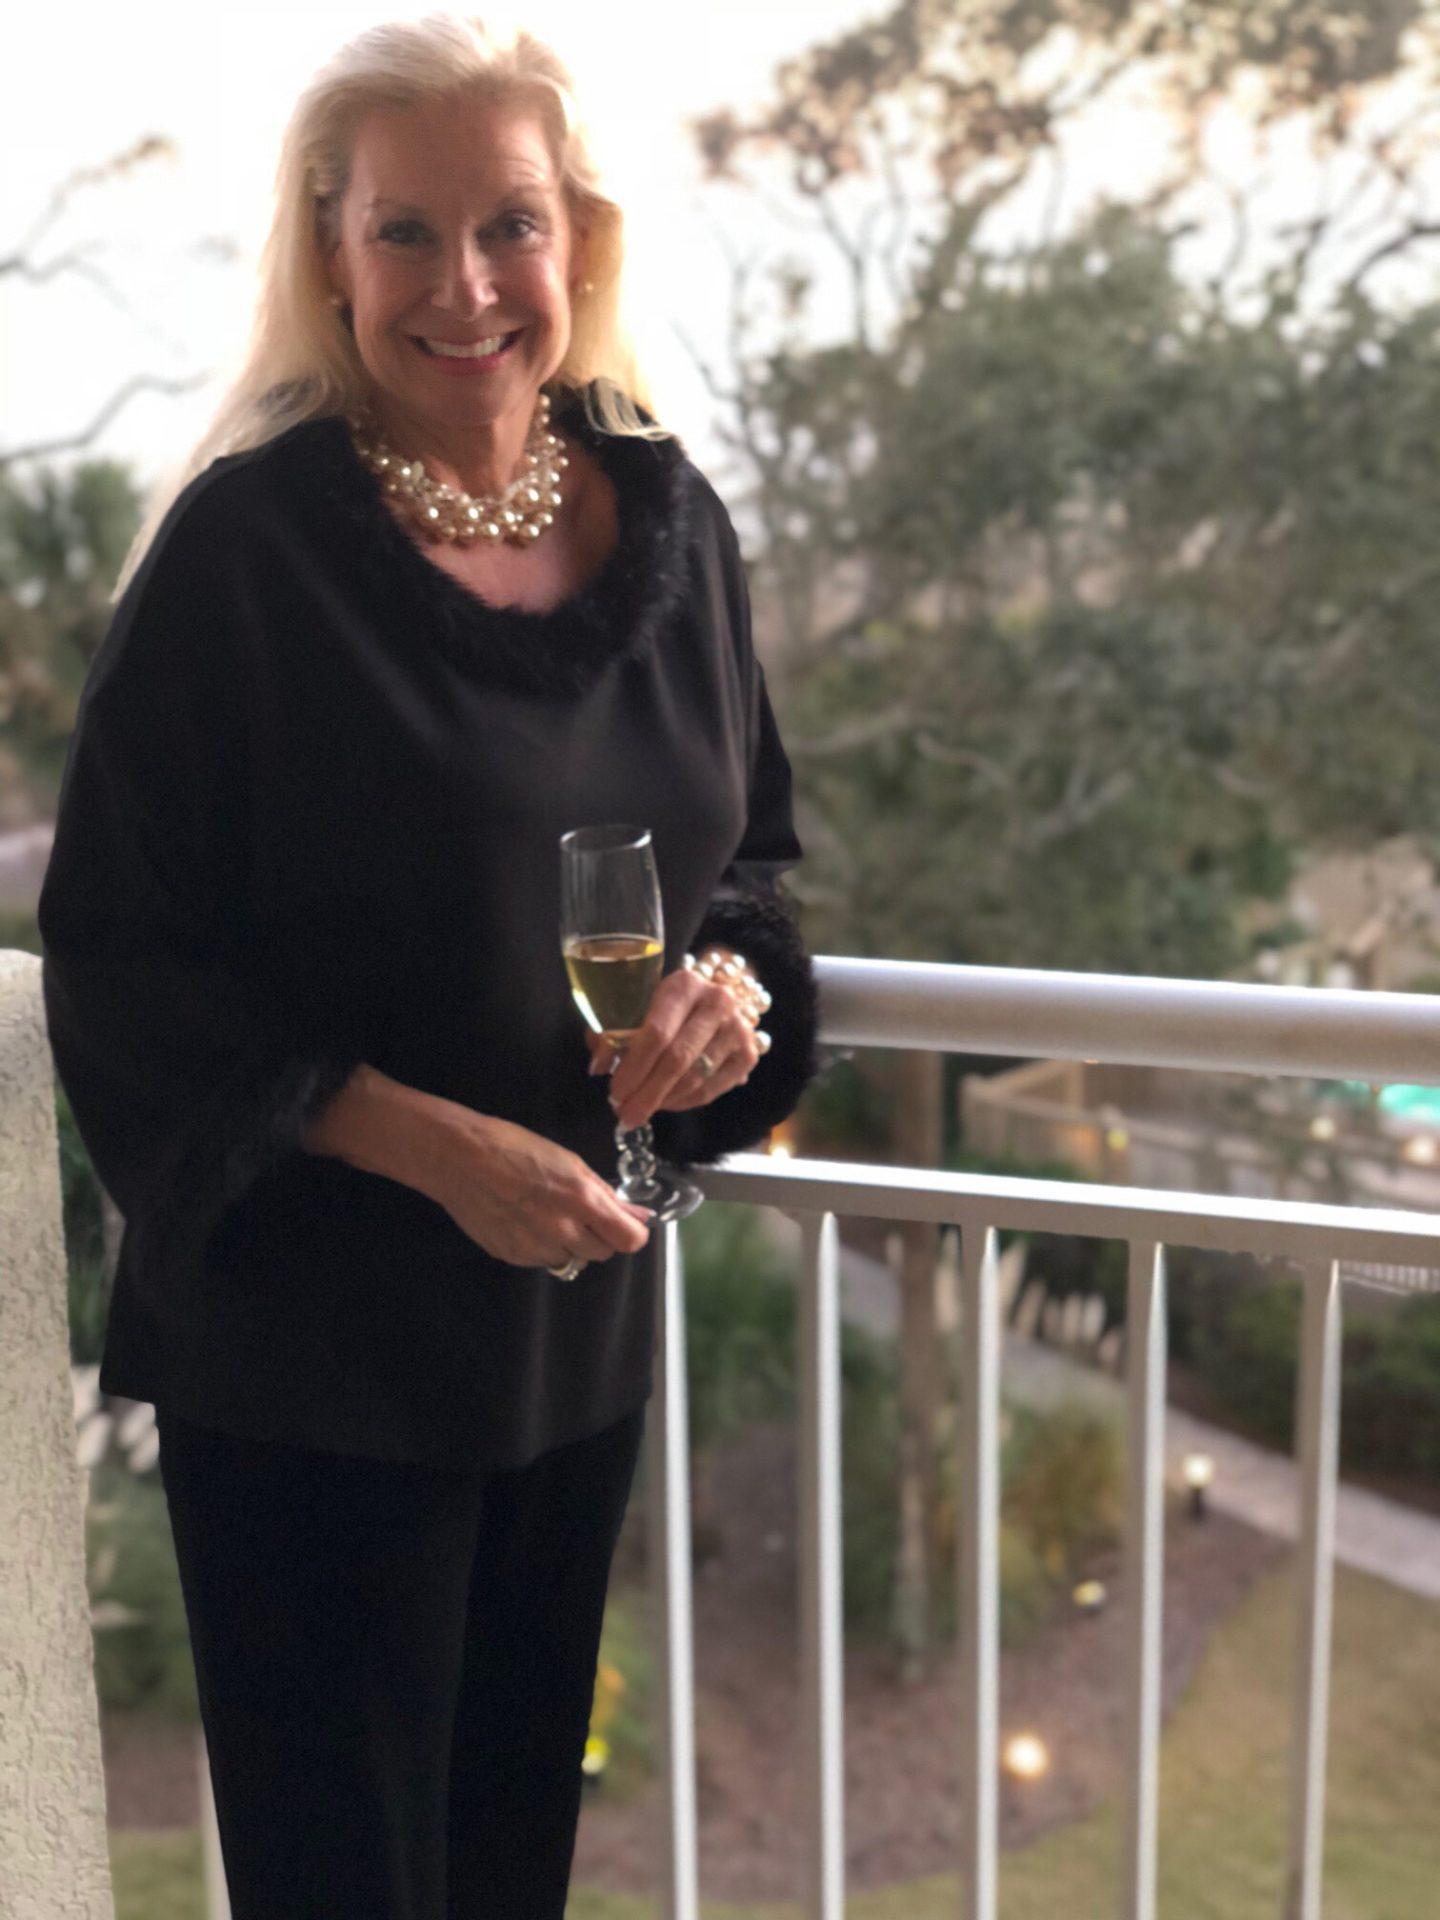 2018 New Year's Resolution- Hello I'm 50ish